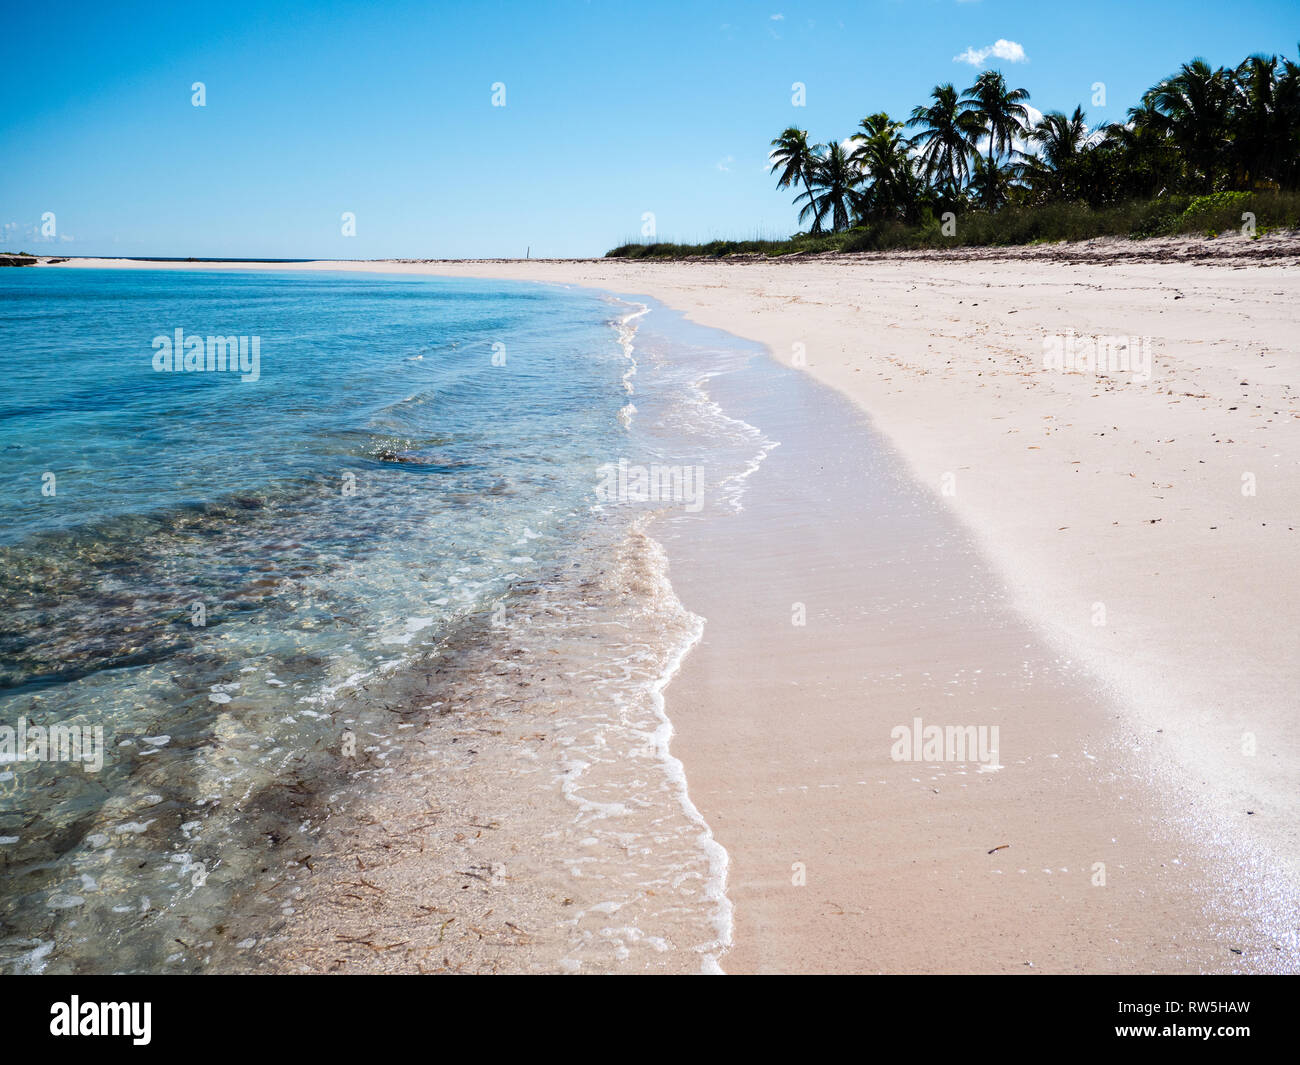 Waves on Shore of Tropical Beach with Palm Trees, Twin Cove Beach, Atlantic Coastline, Eleuthera Island, The Bahamas, The Caribbean. Stock Photo